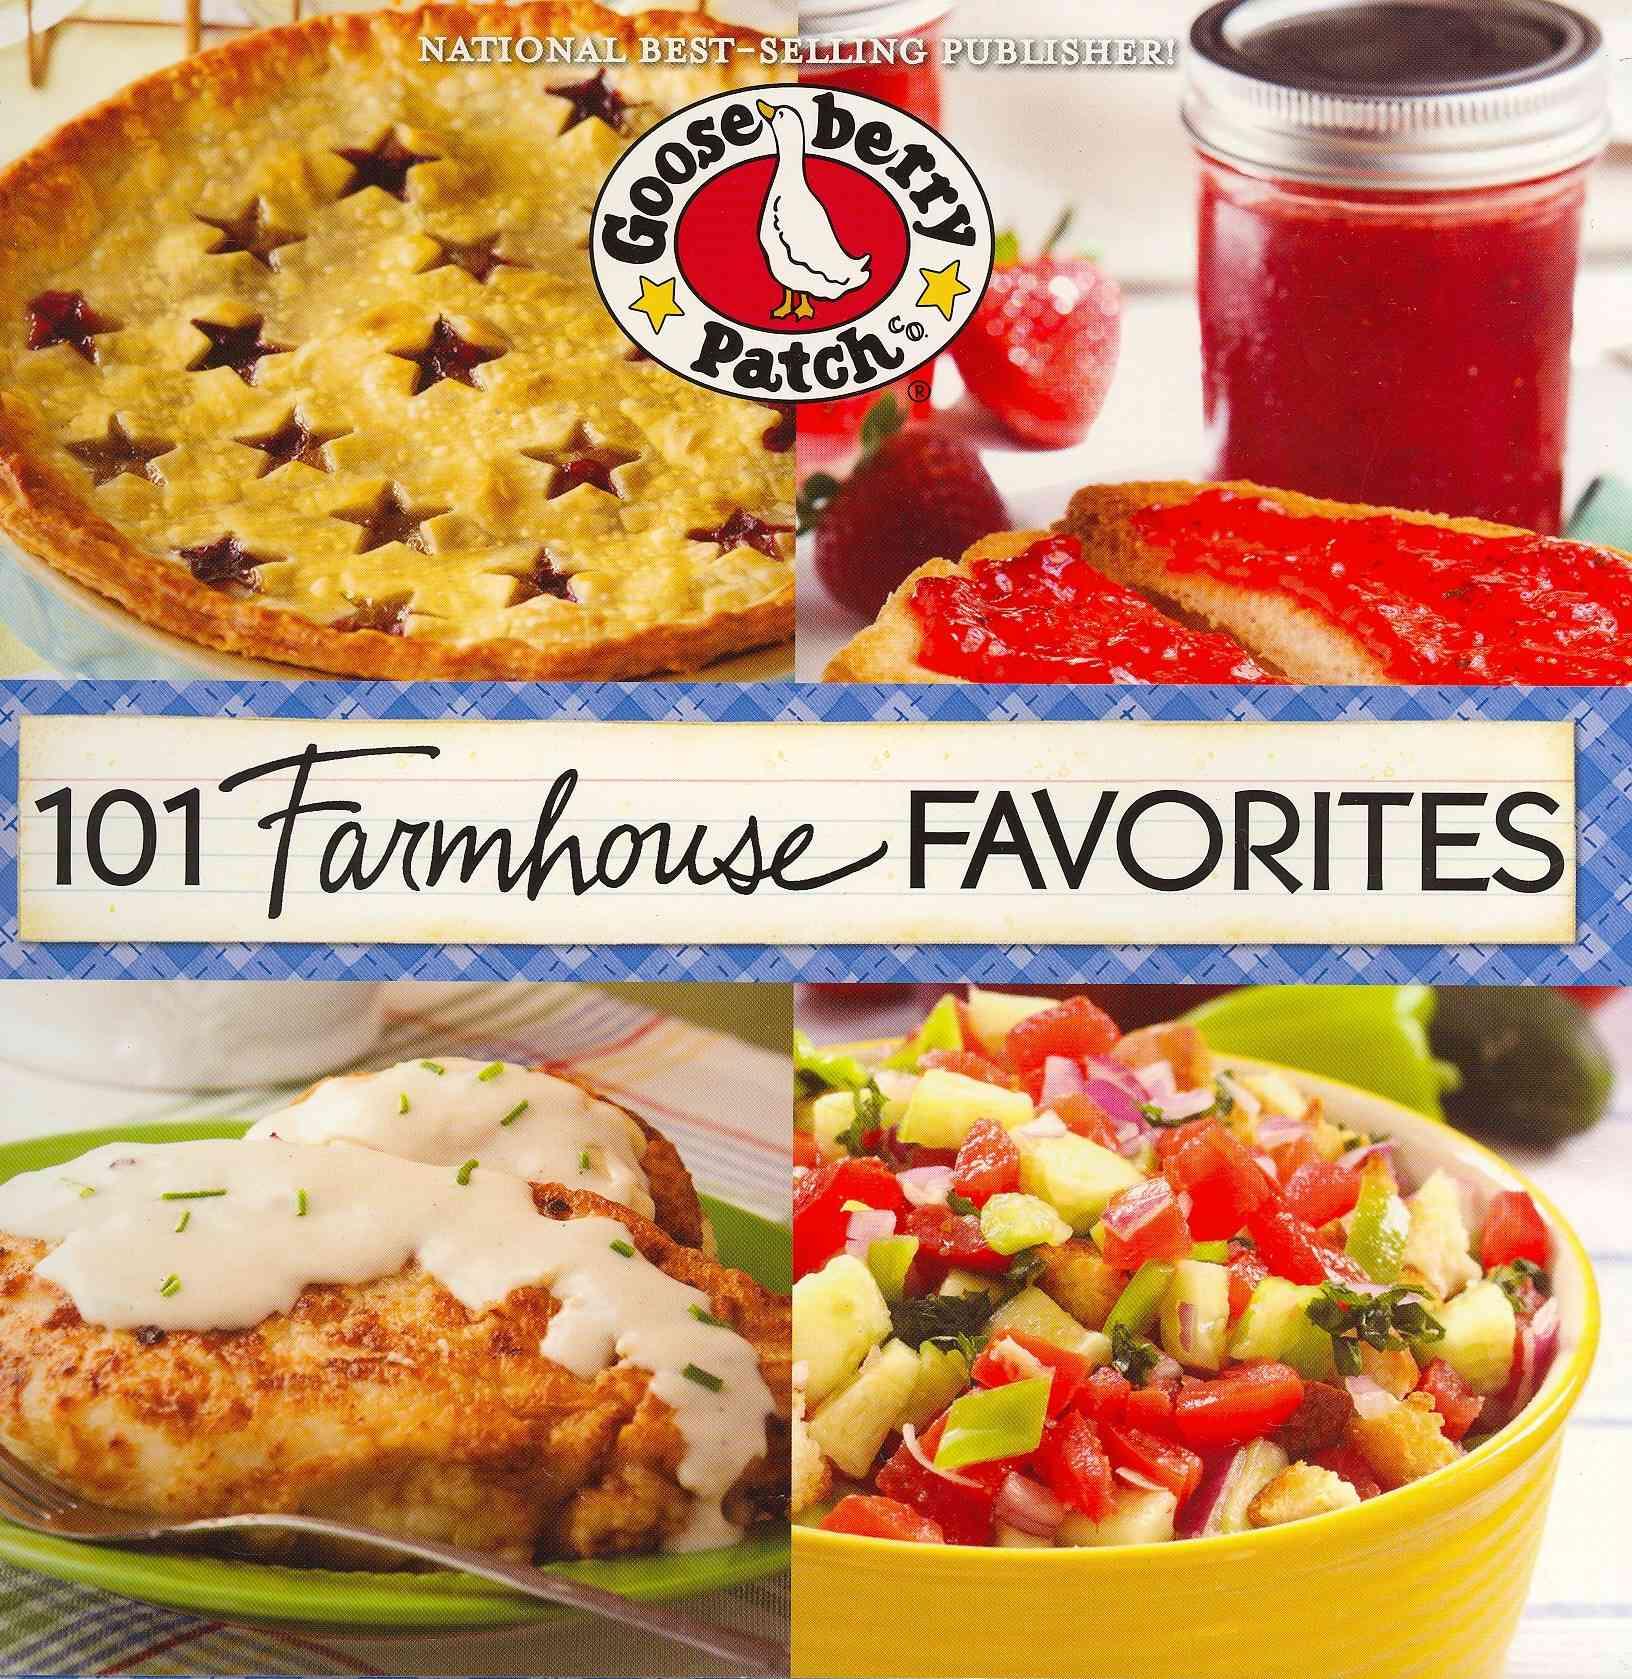 101 Farmhouse Favorites (Paperback)